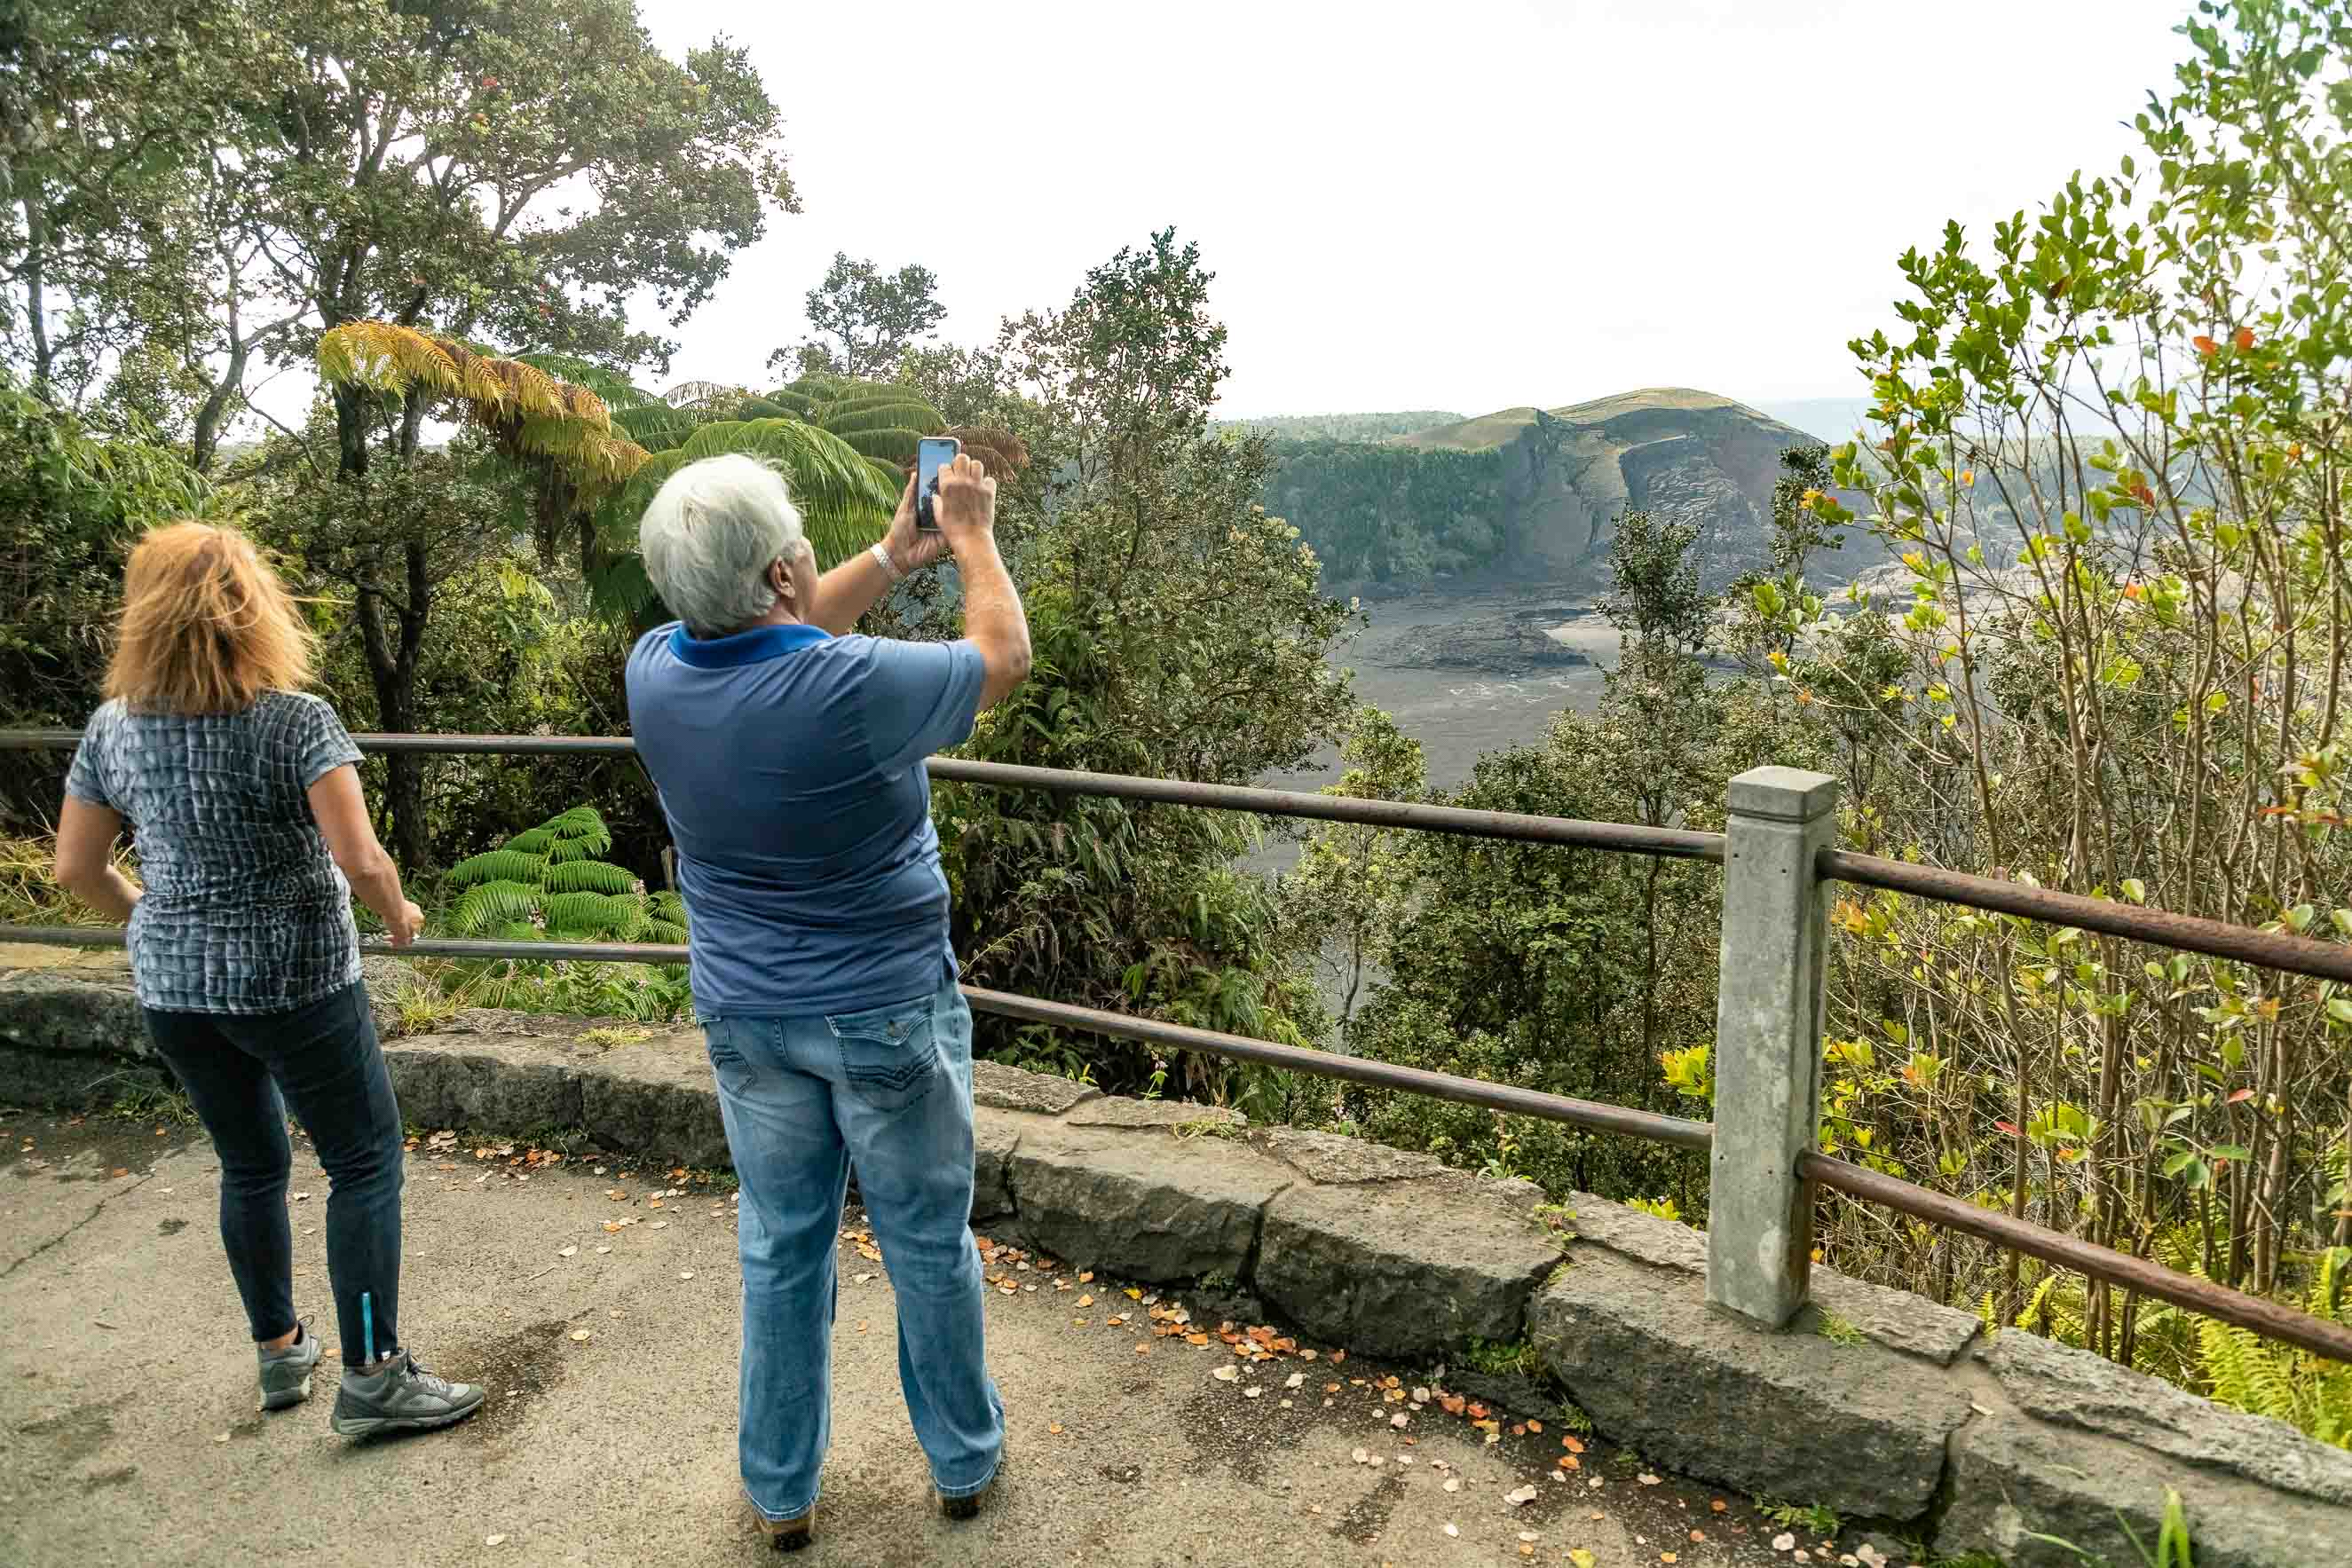 Kilauea Iki Lookout Visitors Big Island